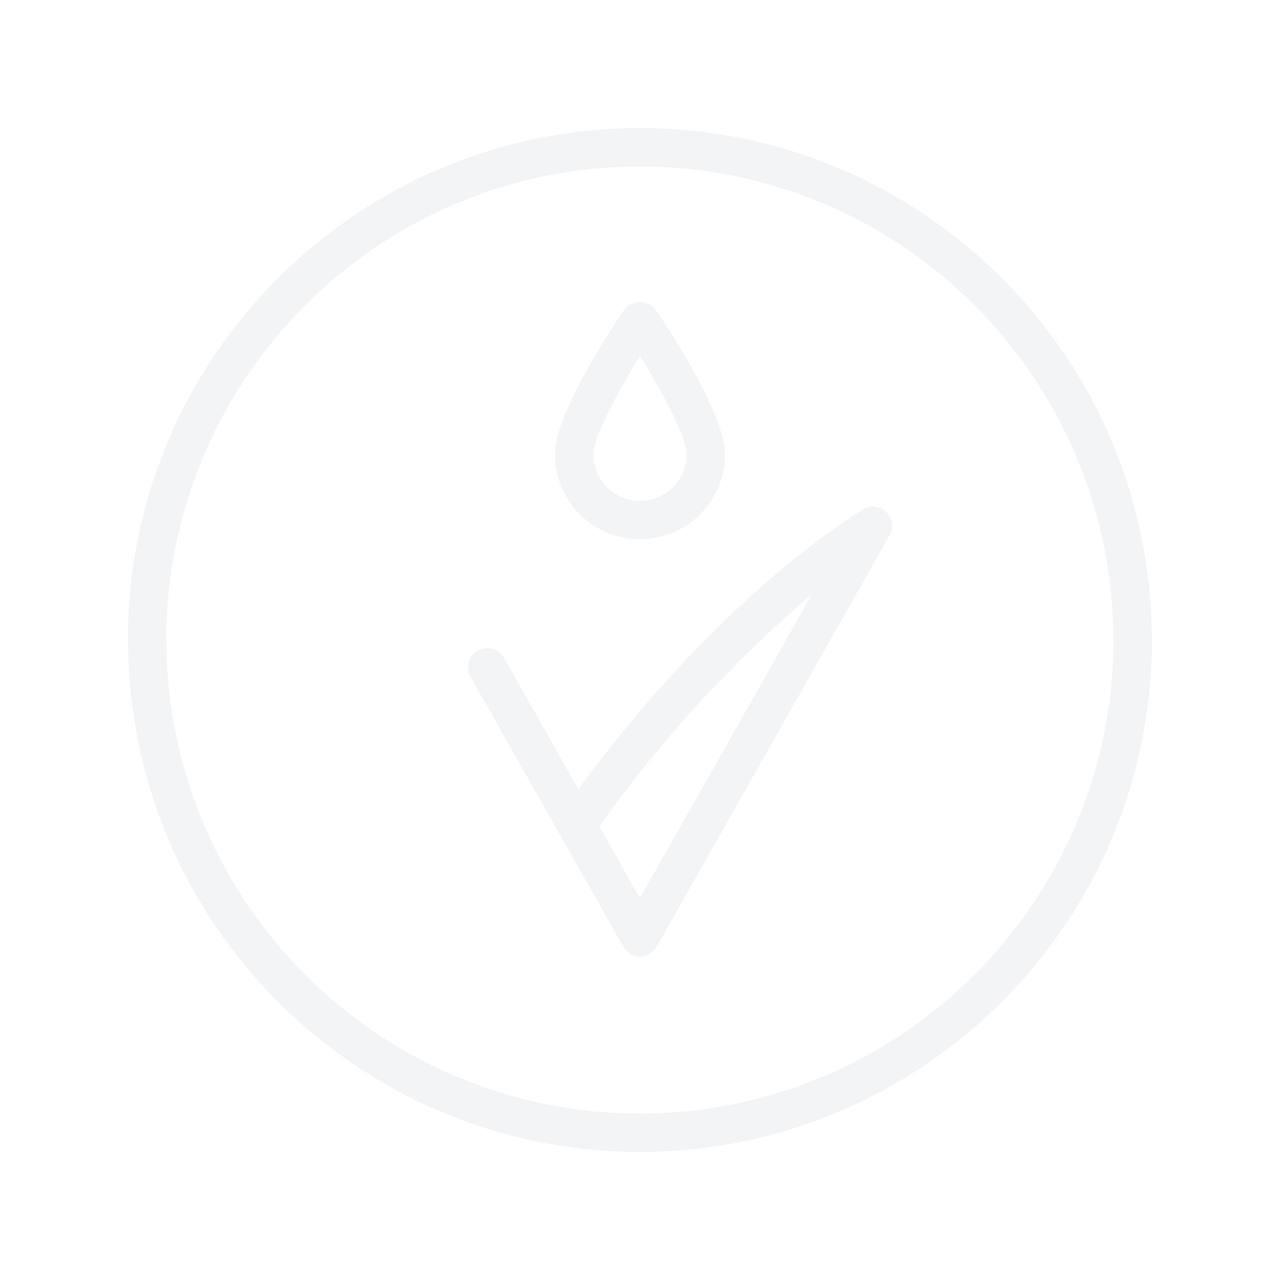 LIERAC Deridium Moisturizing Cream 50ml